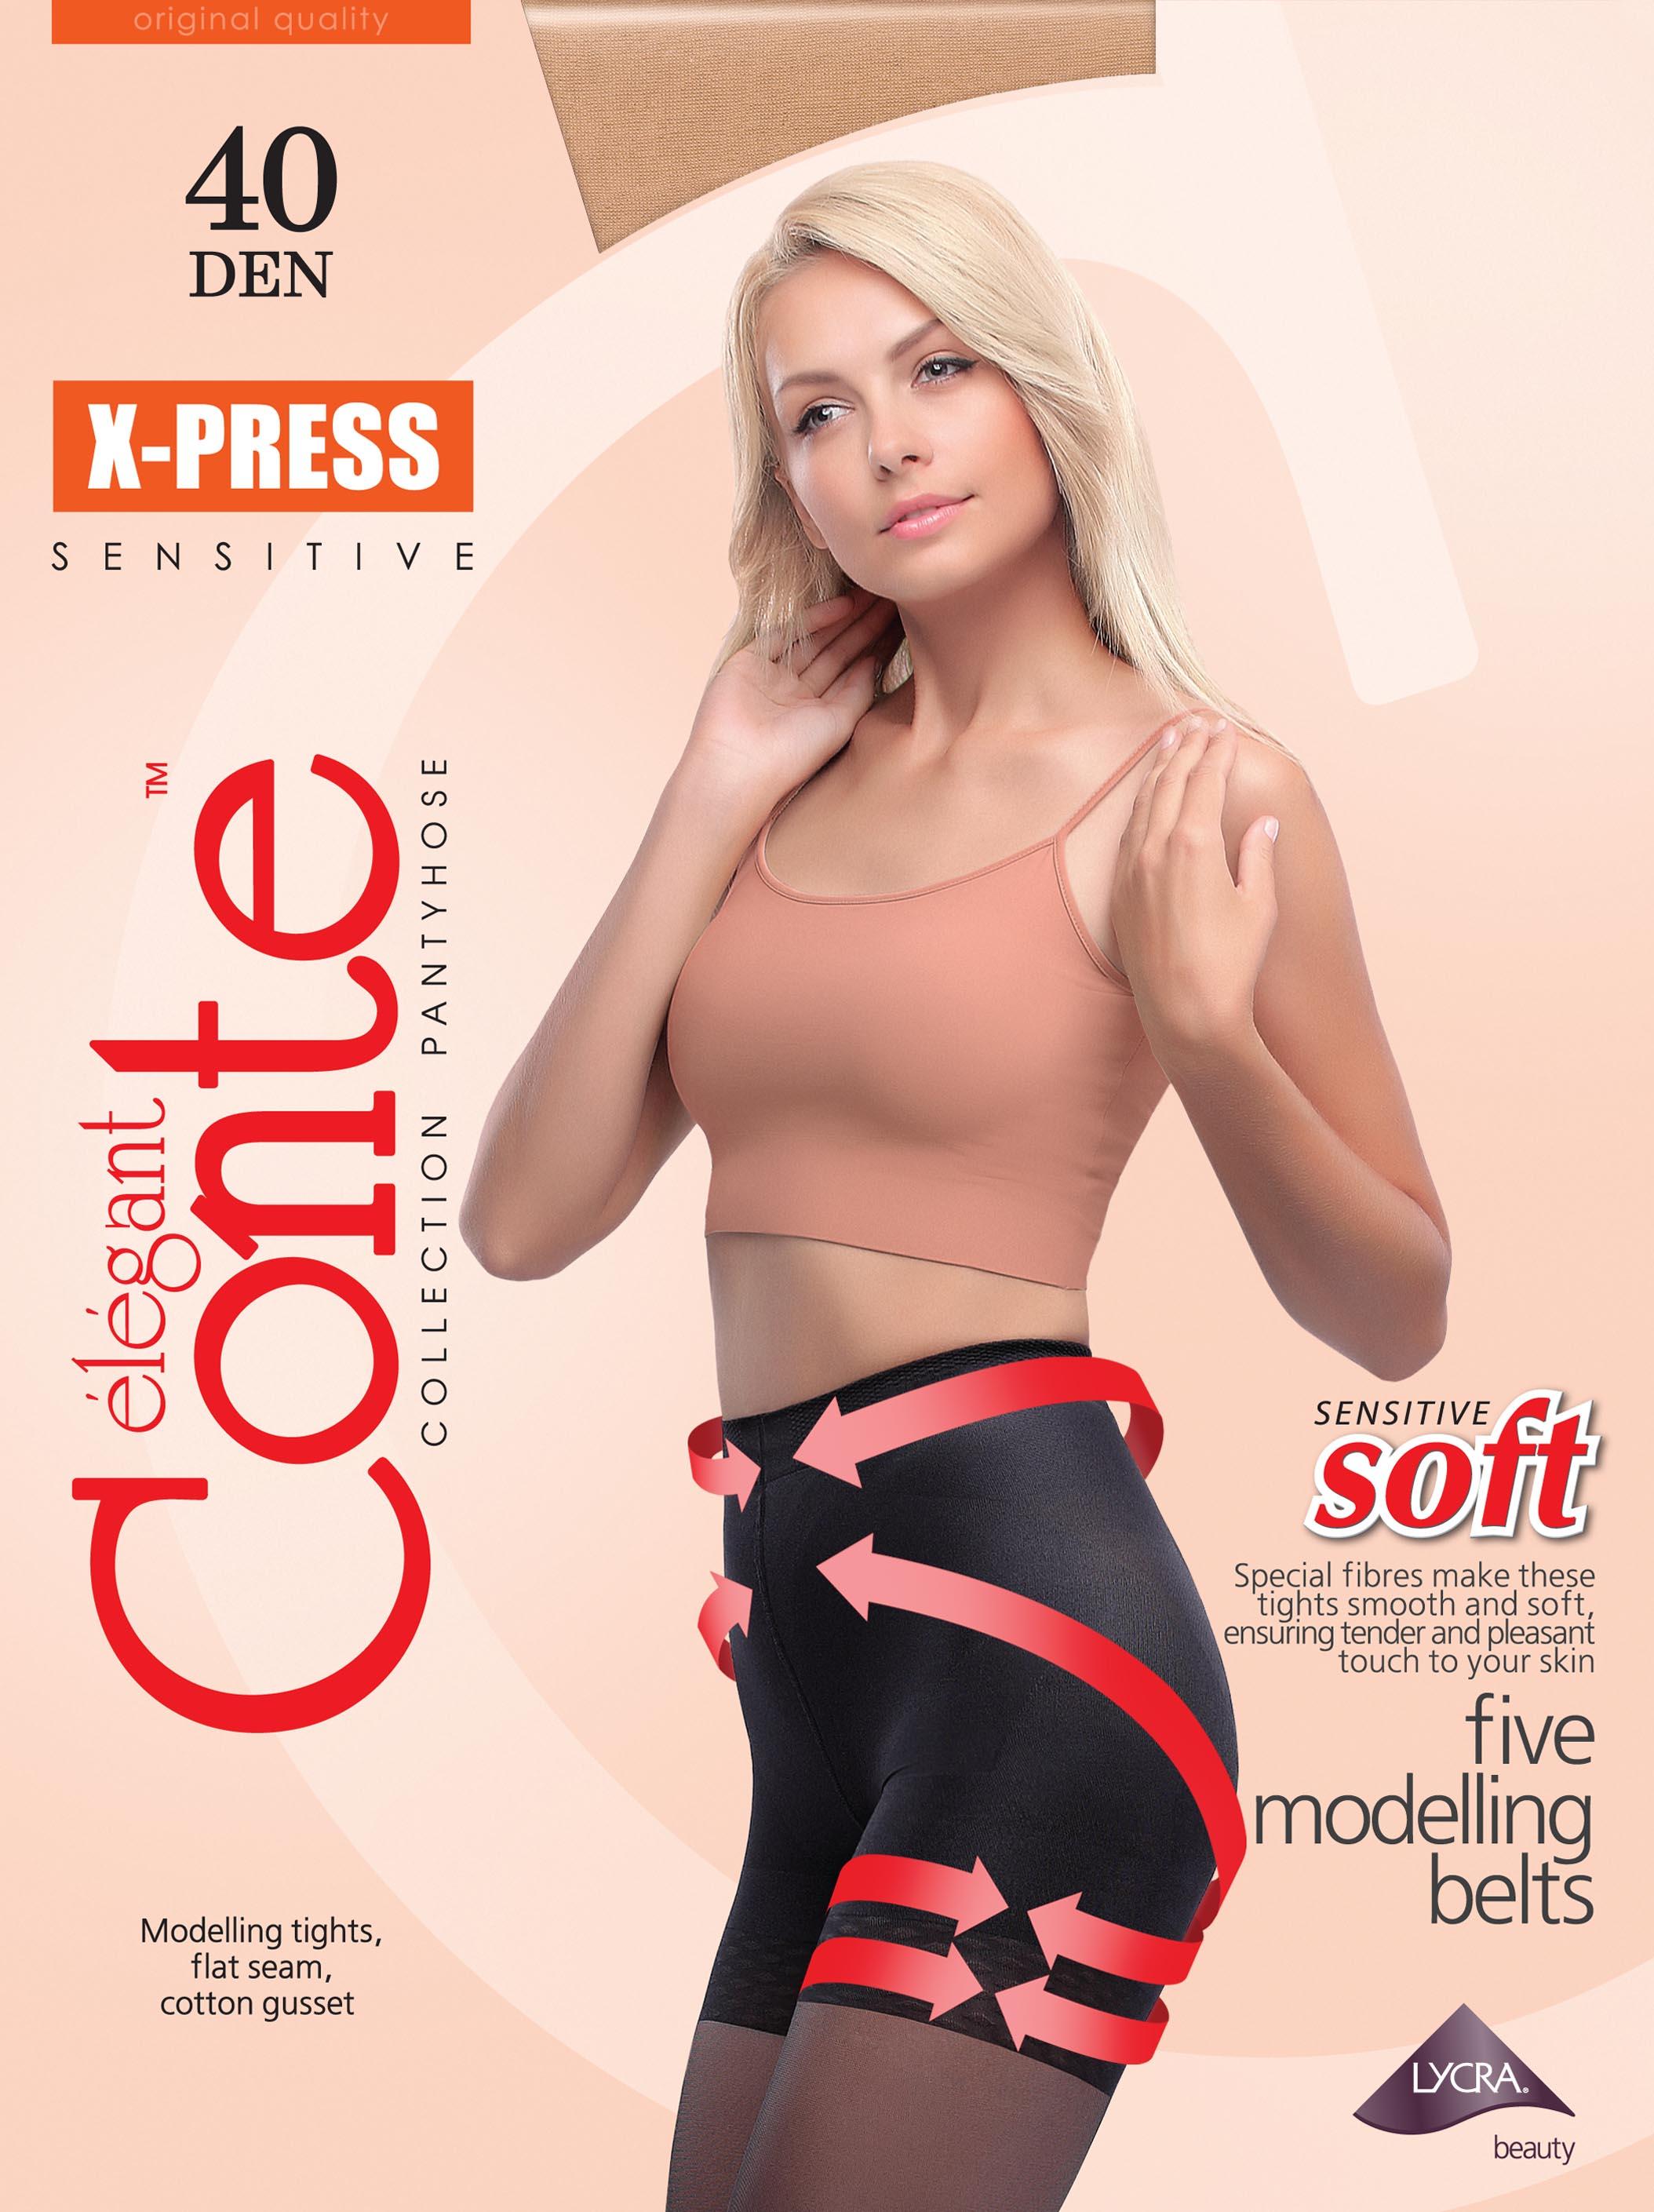 Колготки женские CONTE X-PRESS 40Чулки и колготки<br><br><br>Размер: Bronz (загар)